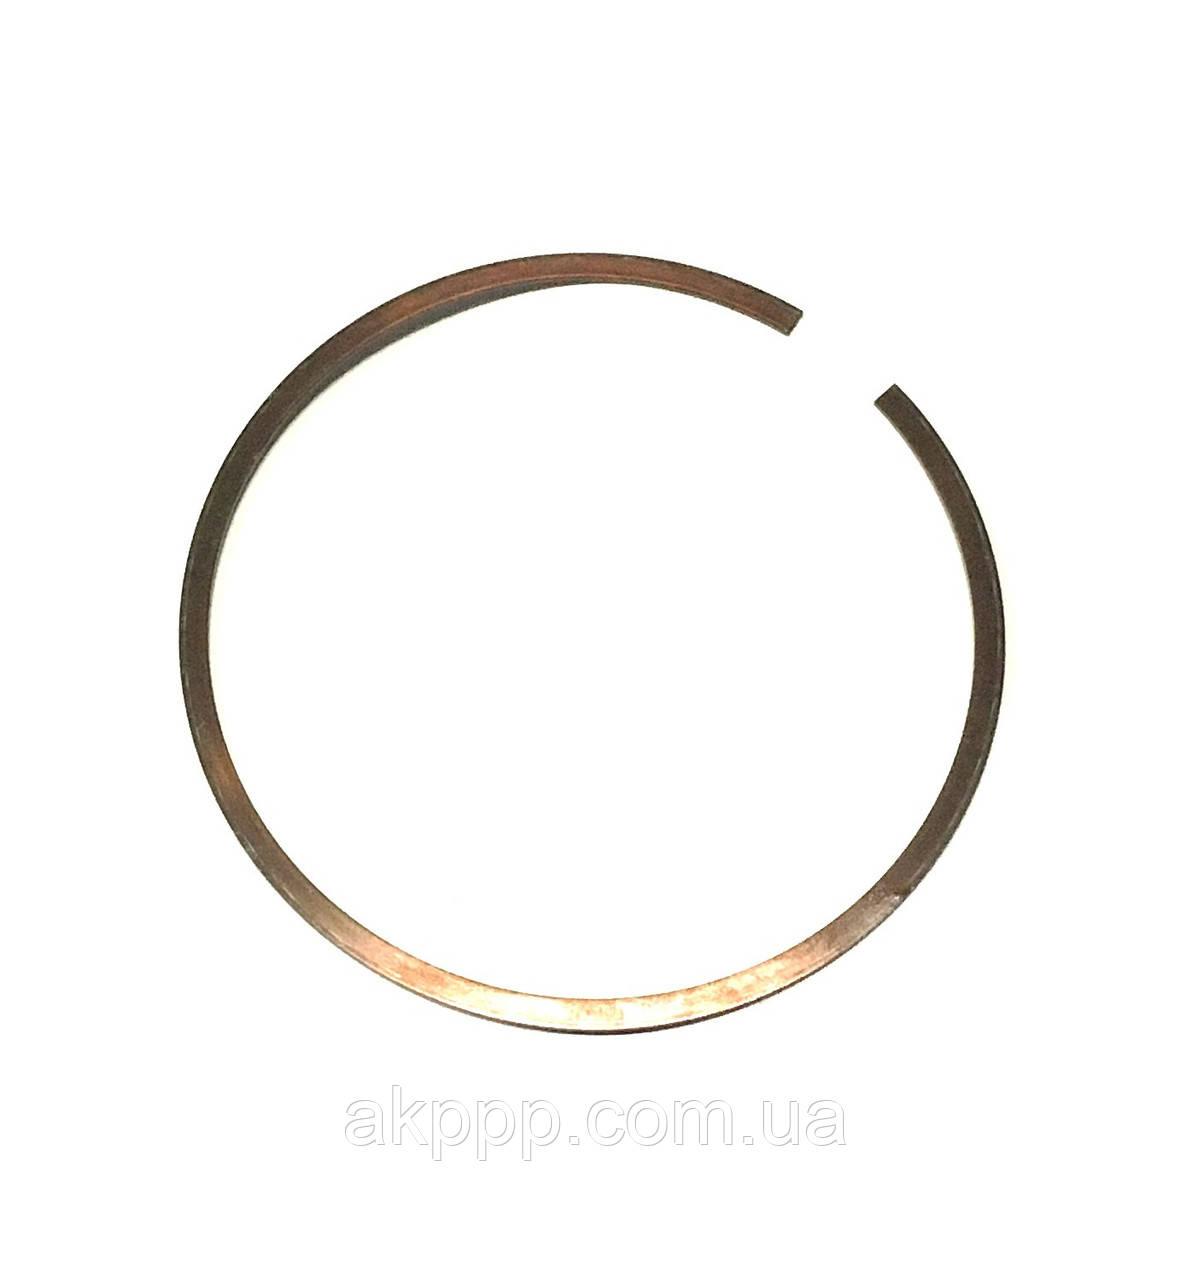 Стопорное кольцо C1/C2 акпп U760E б/у